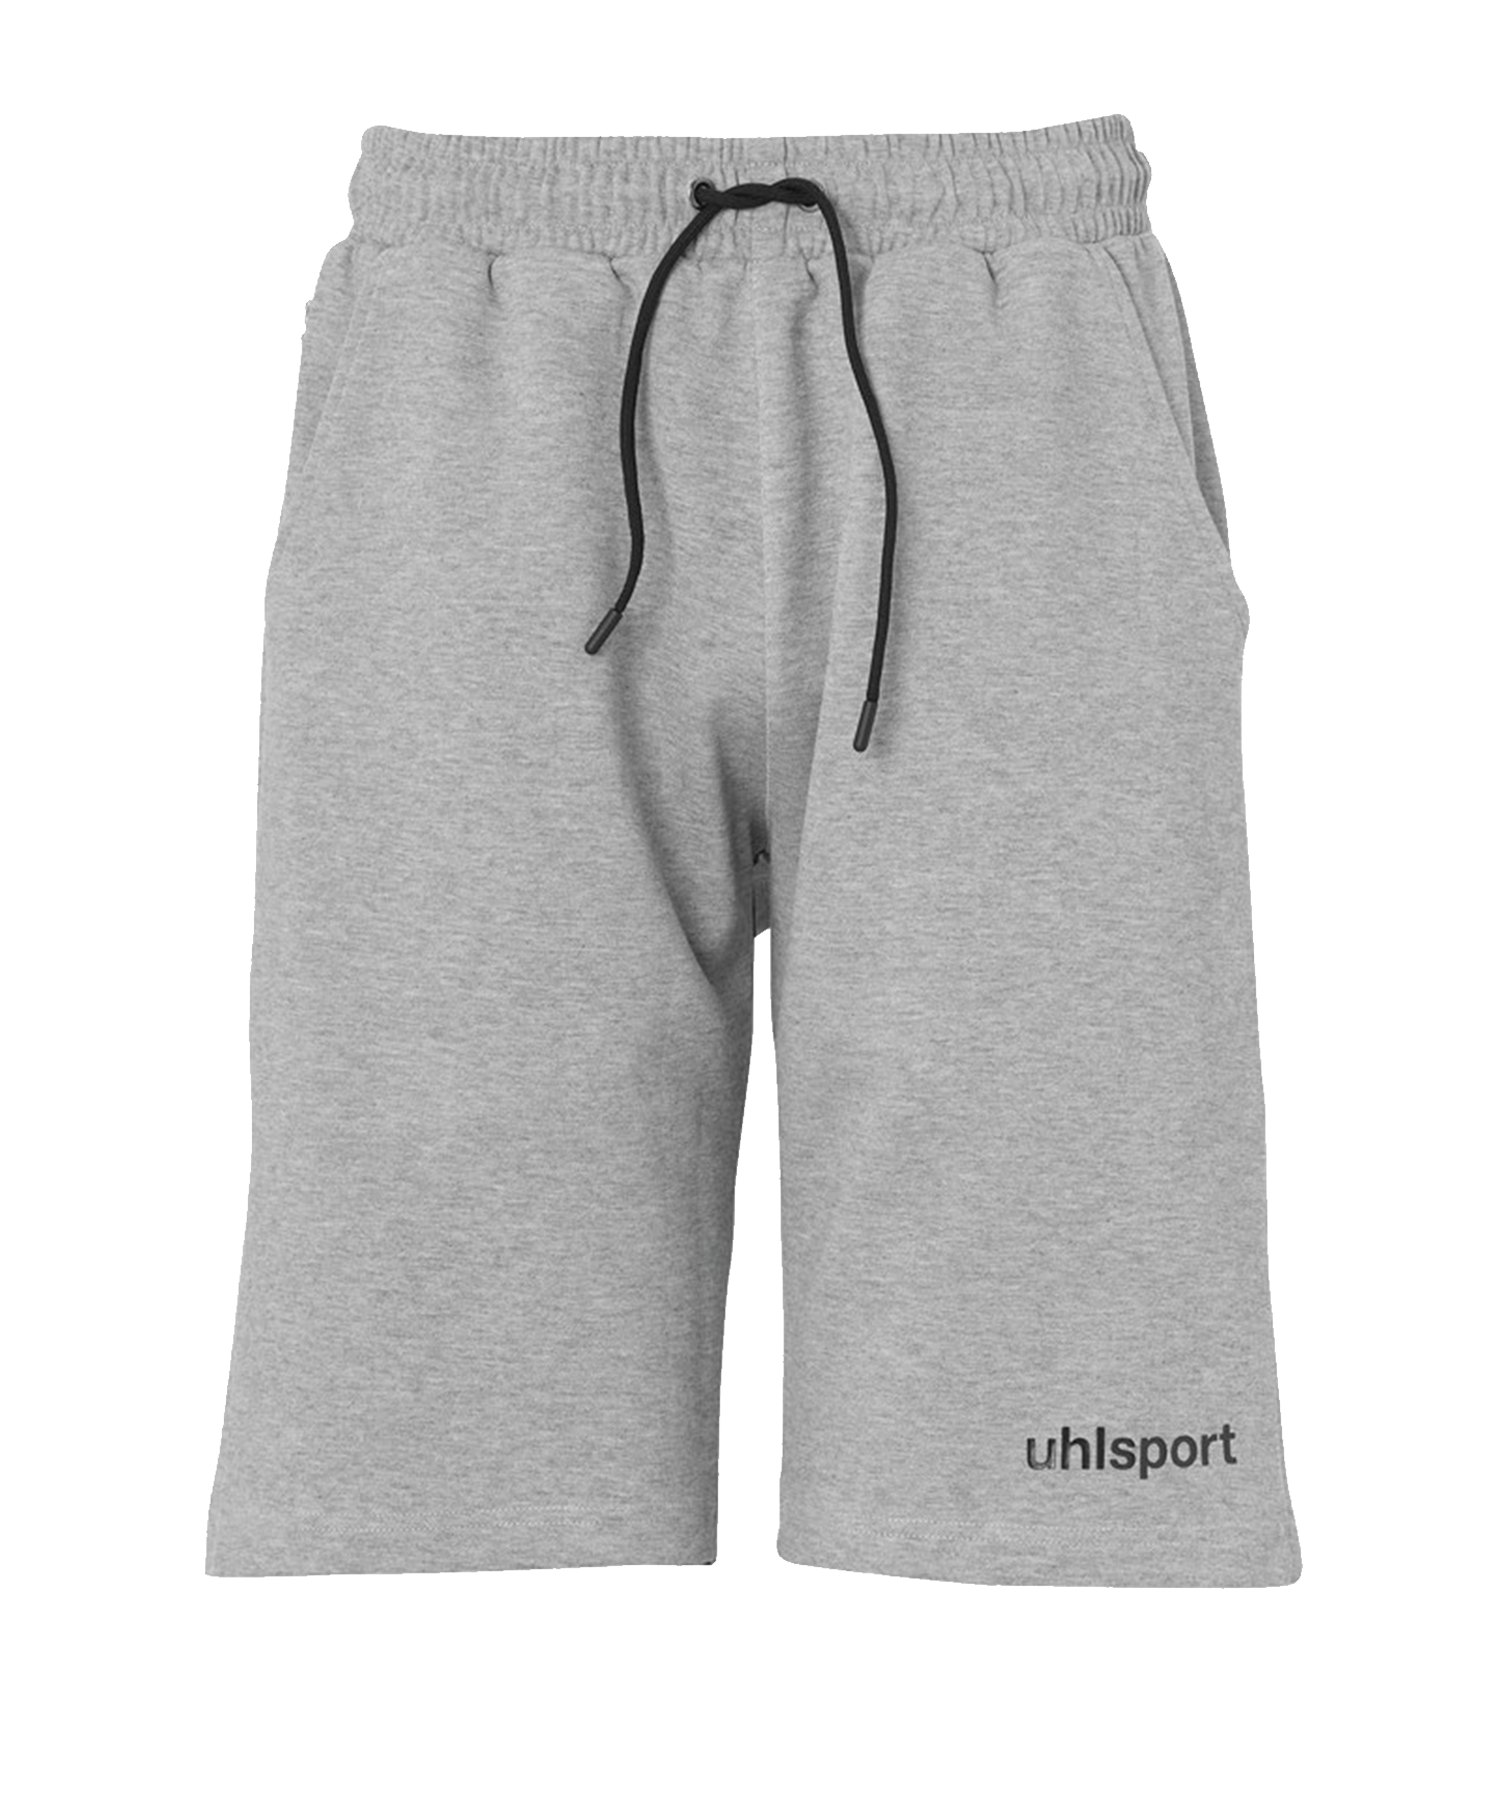 Uhlsport Essential Pro Short Hose kurz Kids F15 - Schwarz